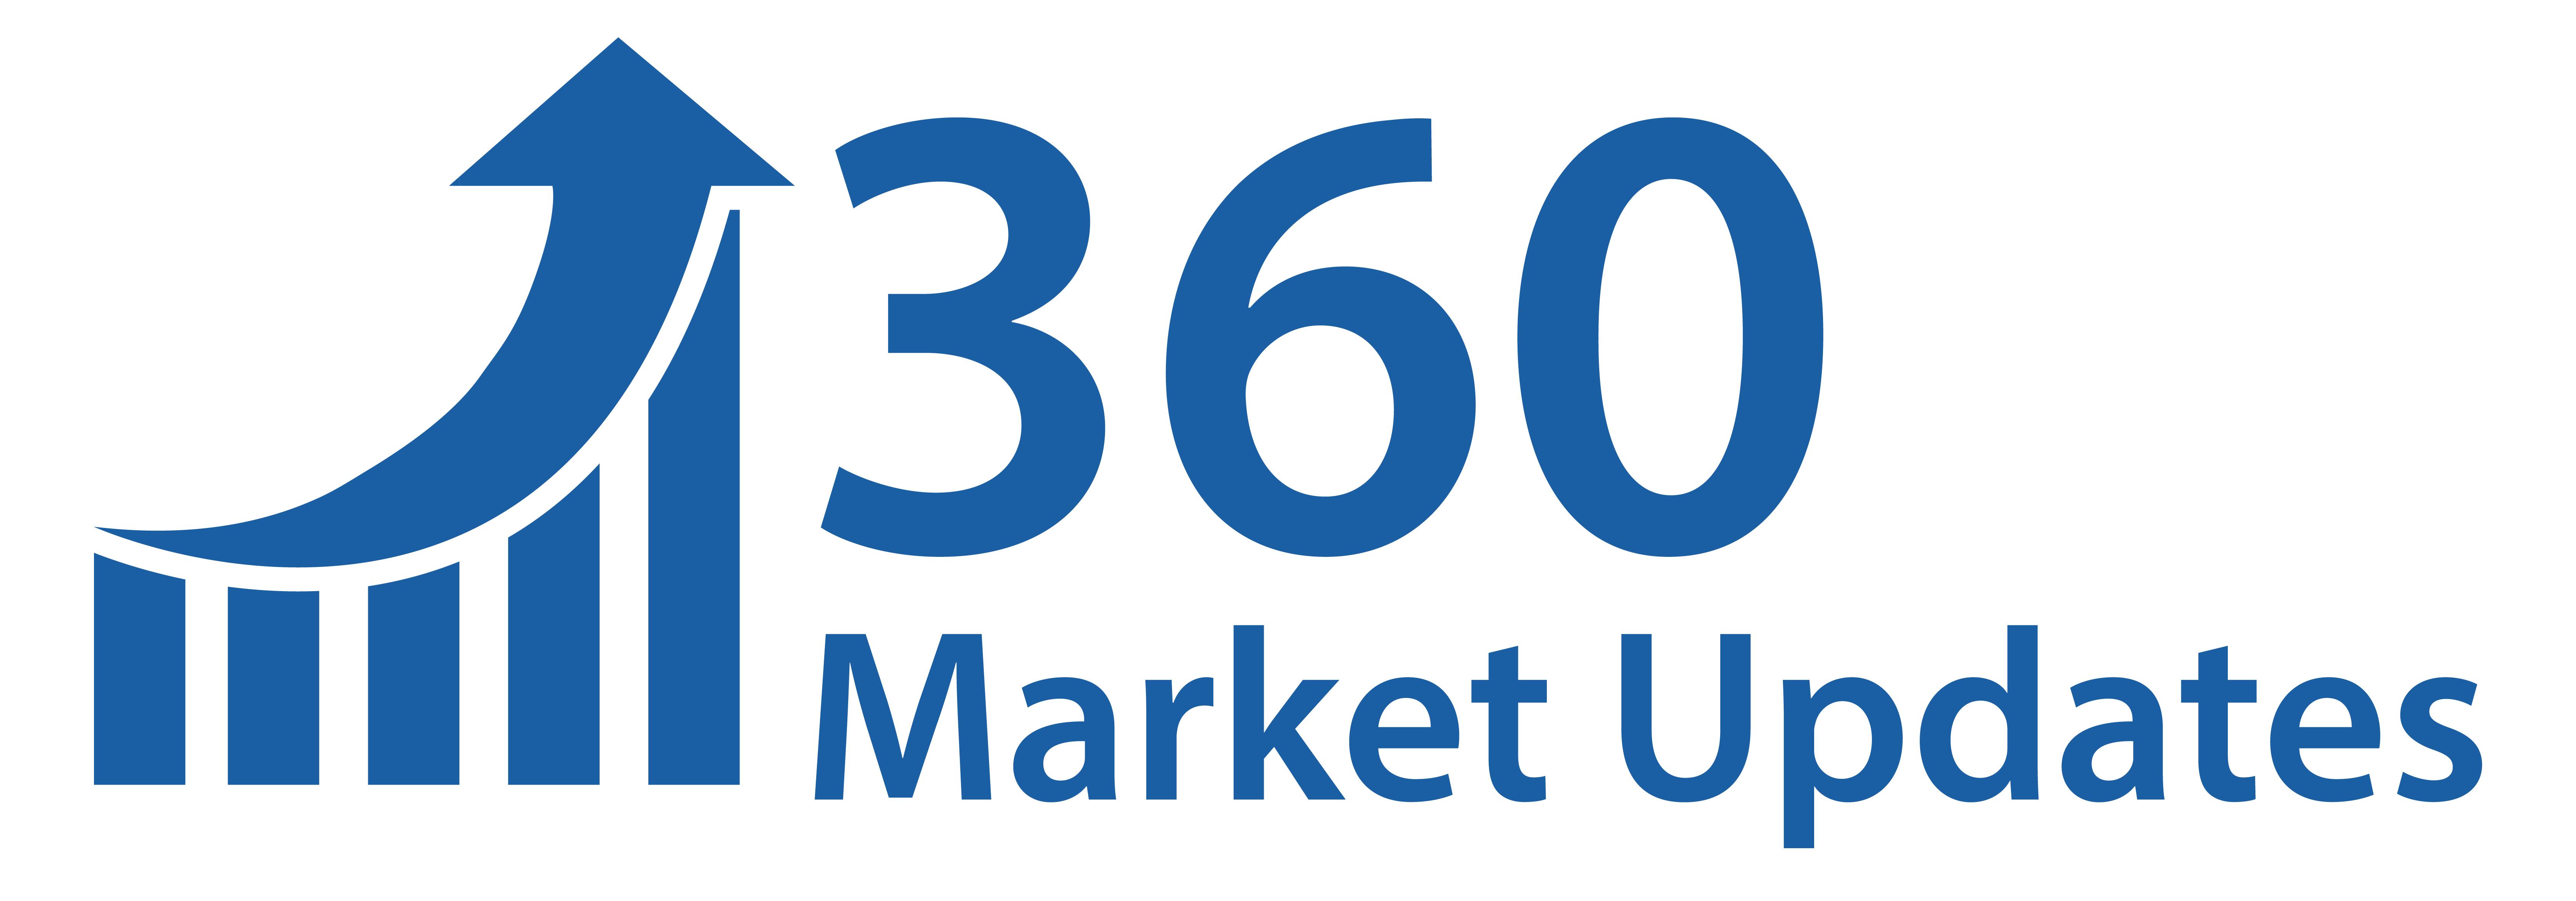 Rotavirus Vaccines Market 2019 : Global Industry Trends, Growth, Size, Segmentation, Future Demands, Latest Innovation, Sales Revenue by Regional Forecast to 2025 | 360 Market Updates